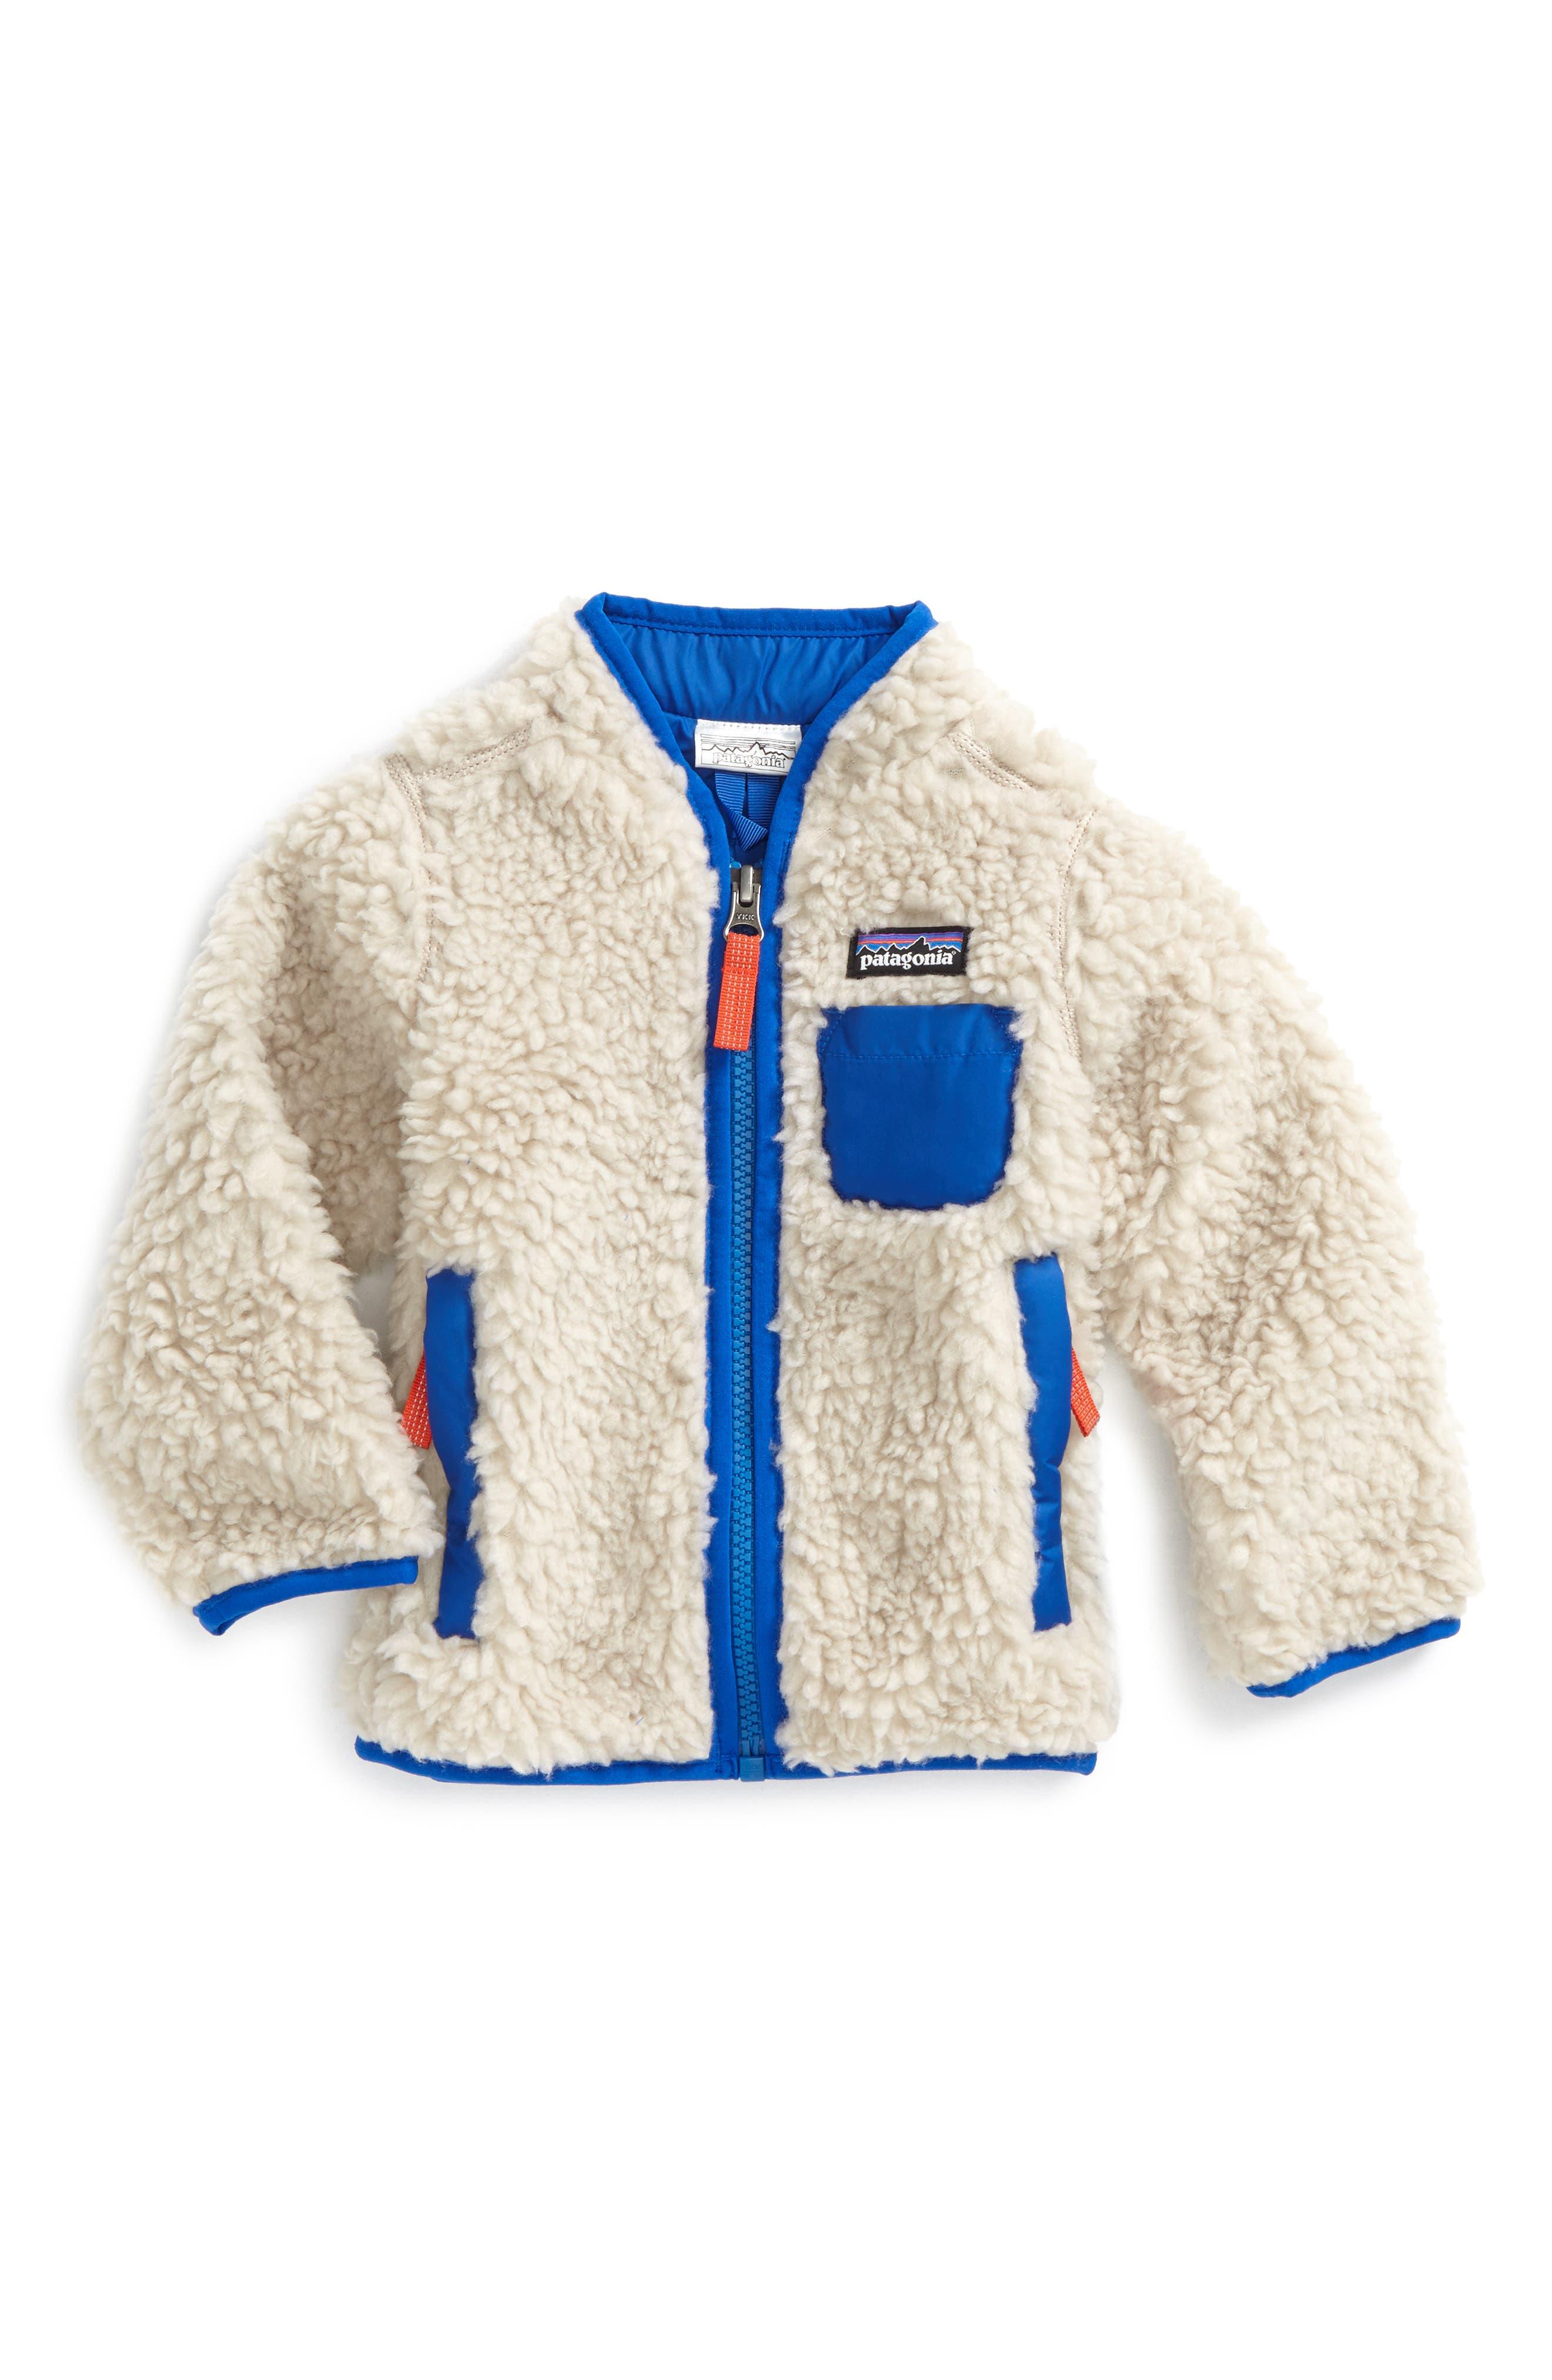 Retro-X Windproof Jacket,                         Main,                         color, 457